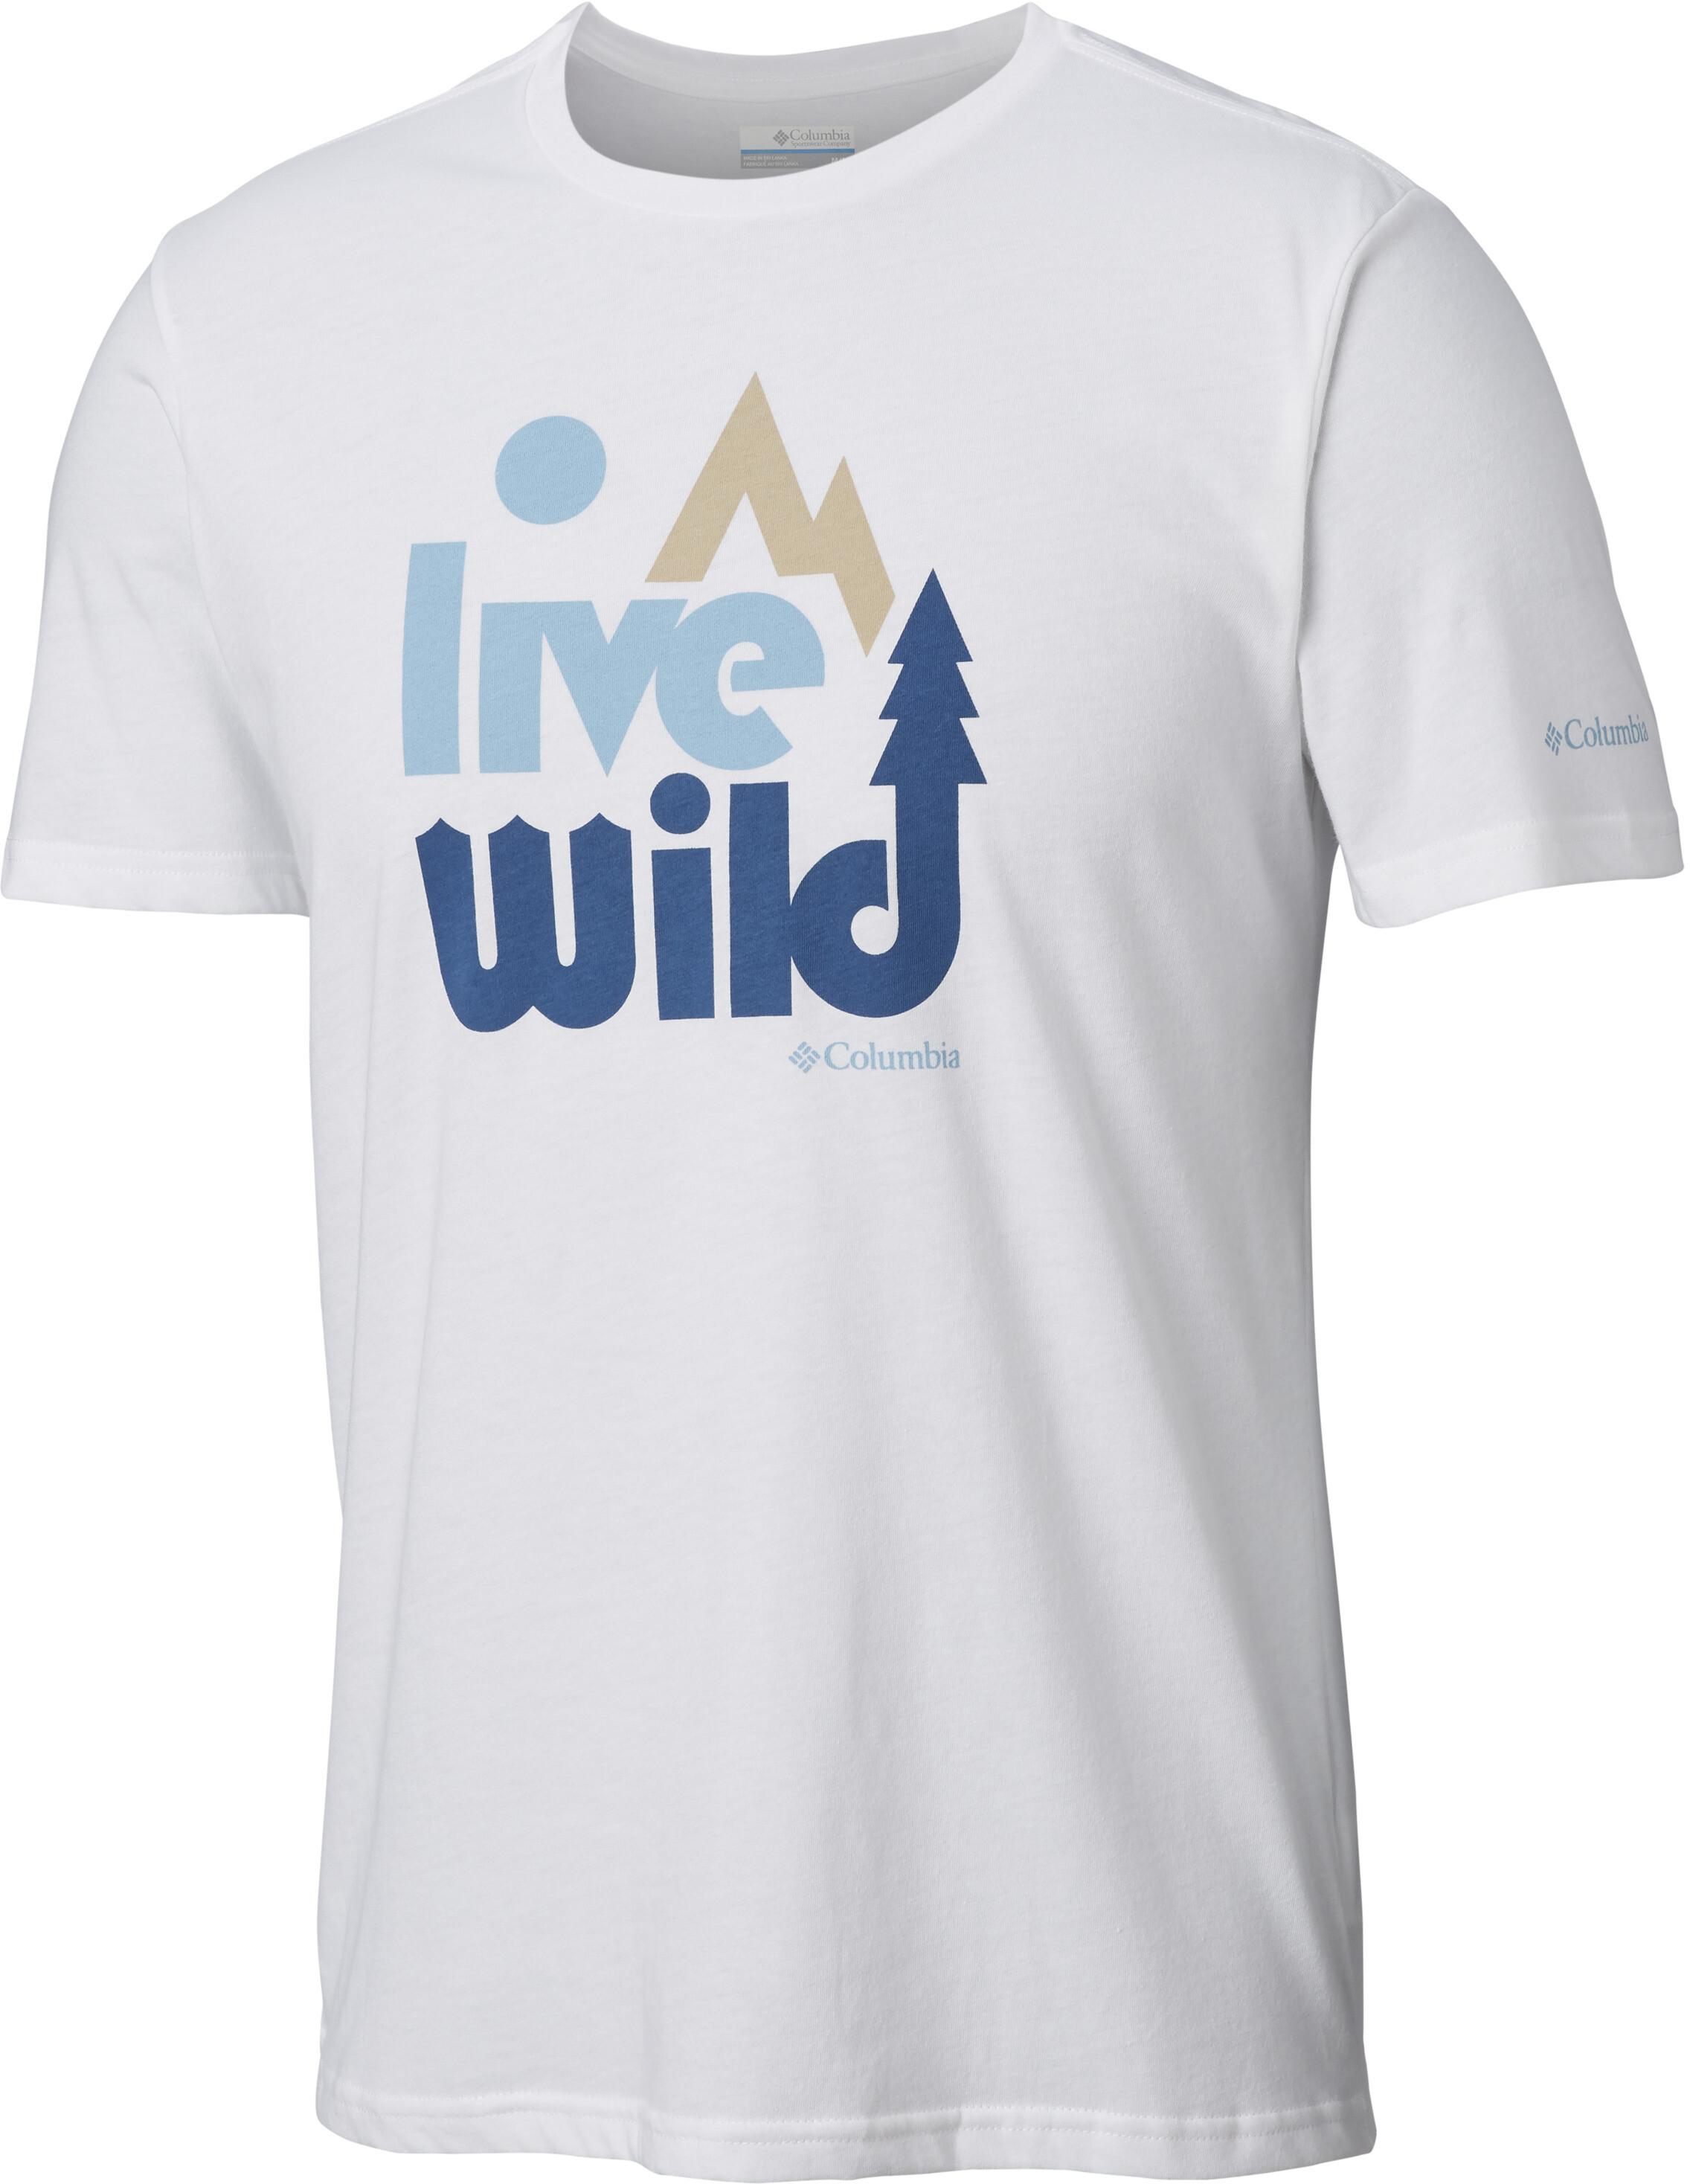 fec25dd040bc1 Columbia Terra Vale - Camiseta manga corta Hombre - blanco